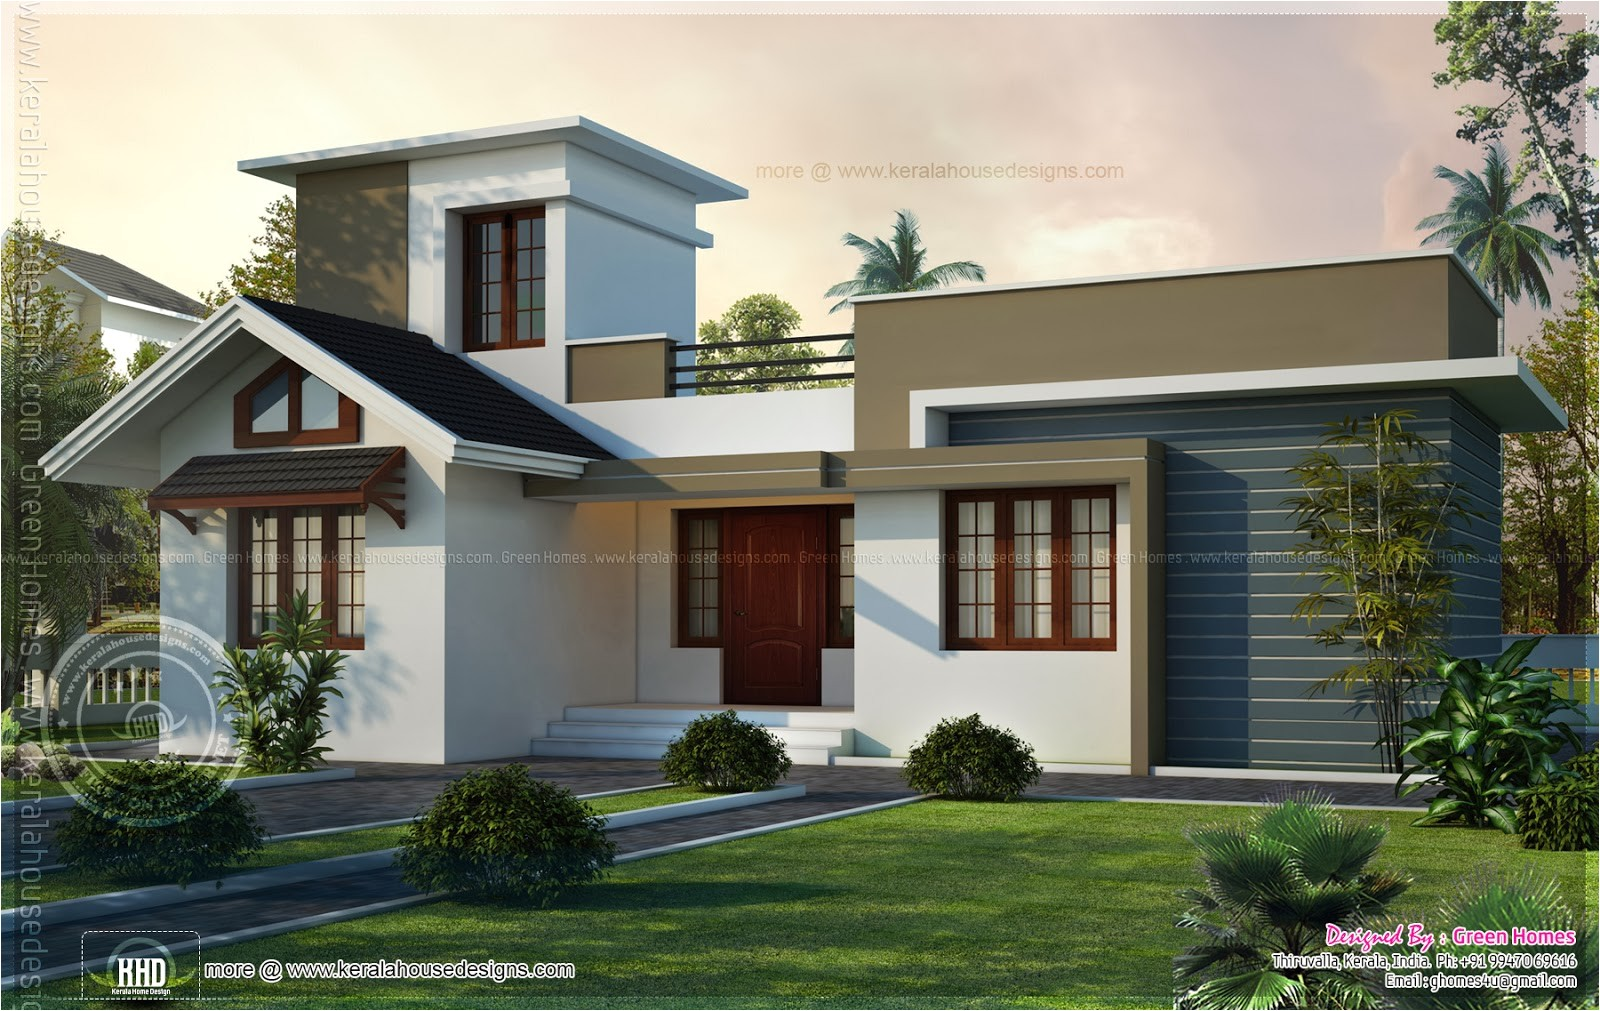 Small Designer Home Plans 1000 Square Feet Small House Design Kerala Home  Design